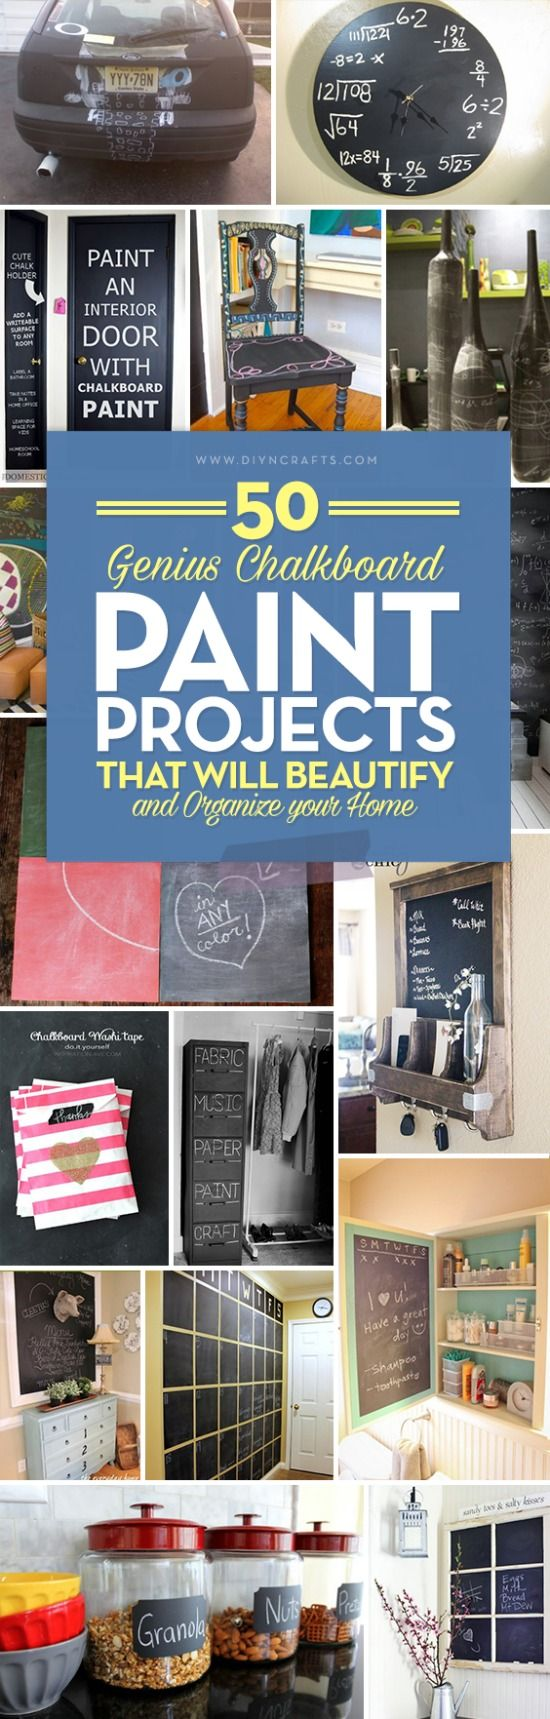 320 best Creative Chalkboards images on Pinterest | Chalkboards ...